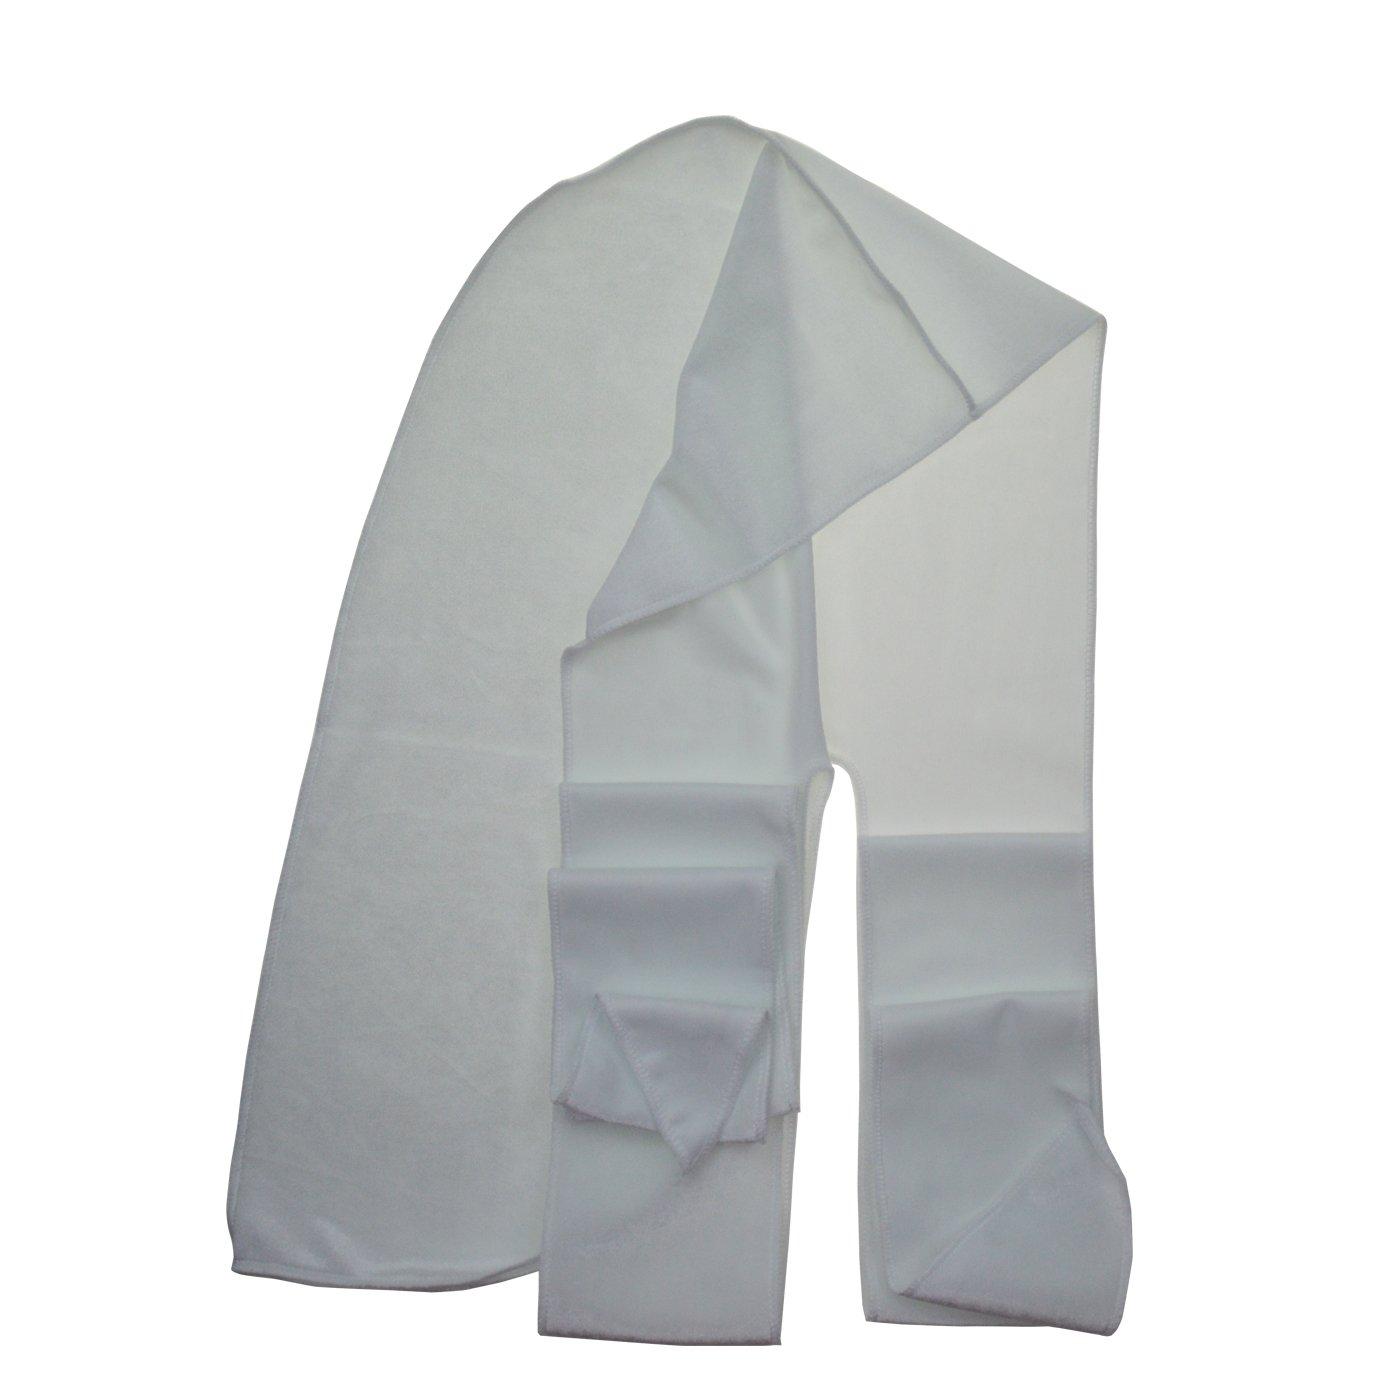 White ASHILISIA Premium Velvet Durag 360, 540,720 540,720 540,720 Waves Extra Long Tail and Wide Straps Outside Seams Triple Stitch for Du-RAG dd8db3